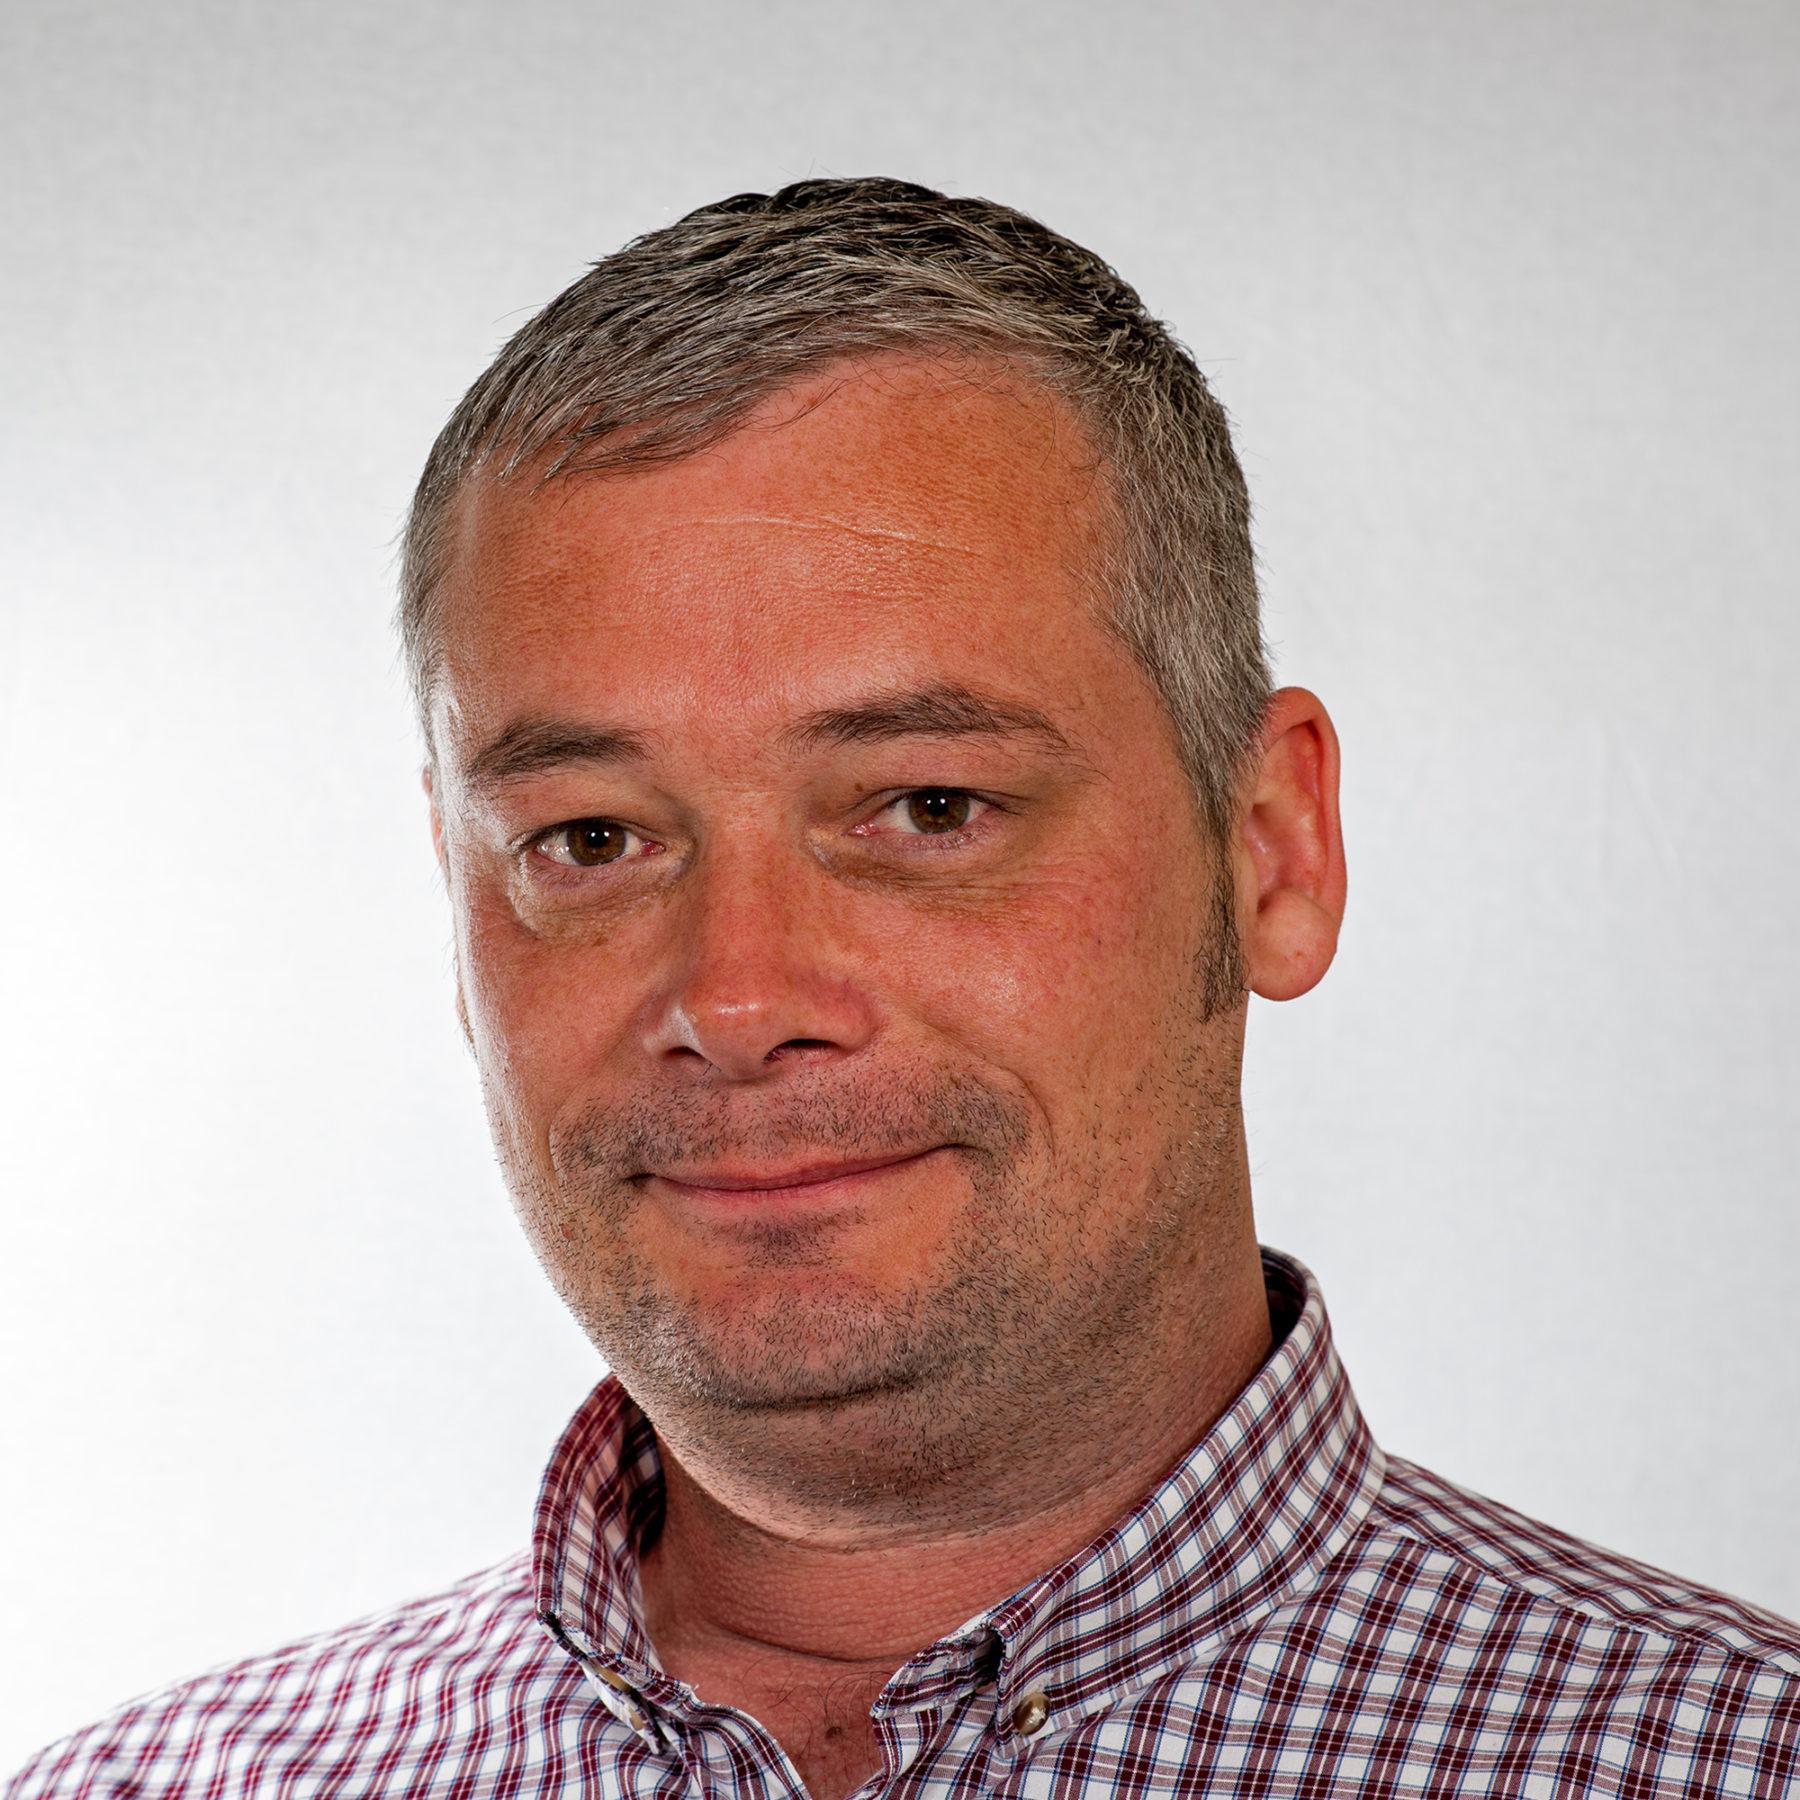 Alan Colgate, Commercial Manager, RJ Dance (Contractors) Limited